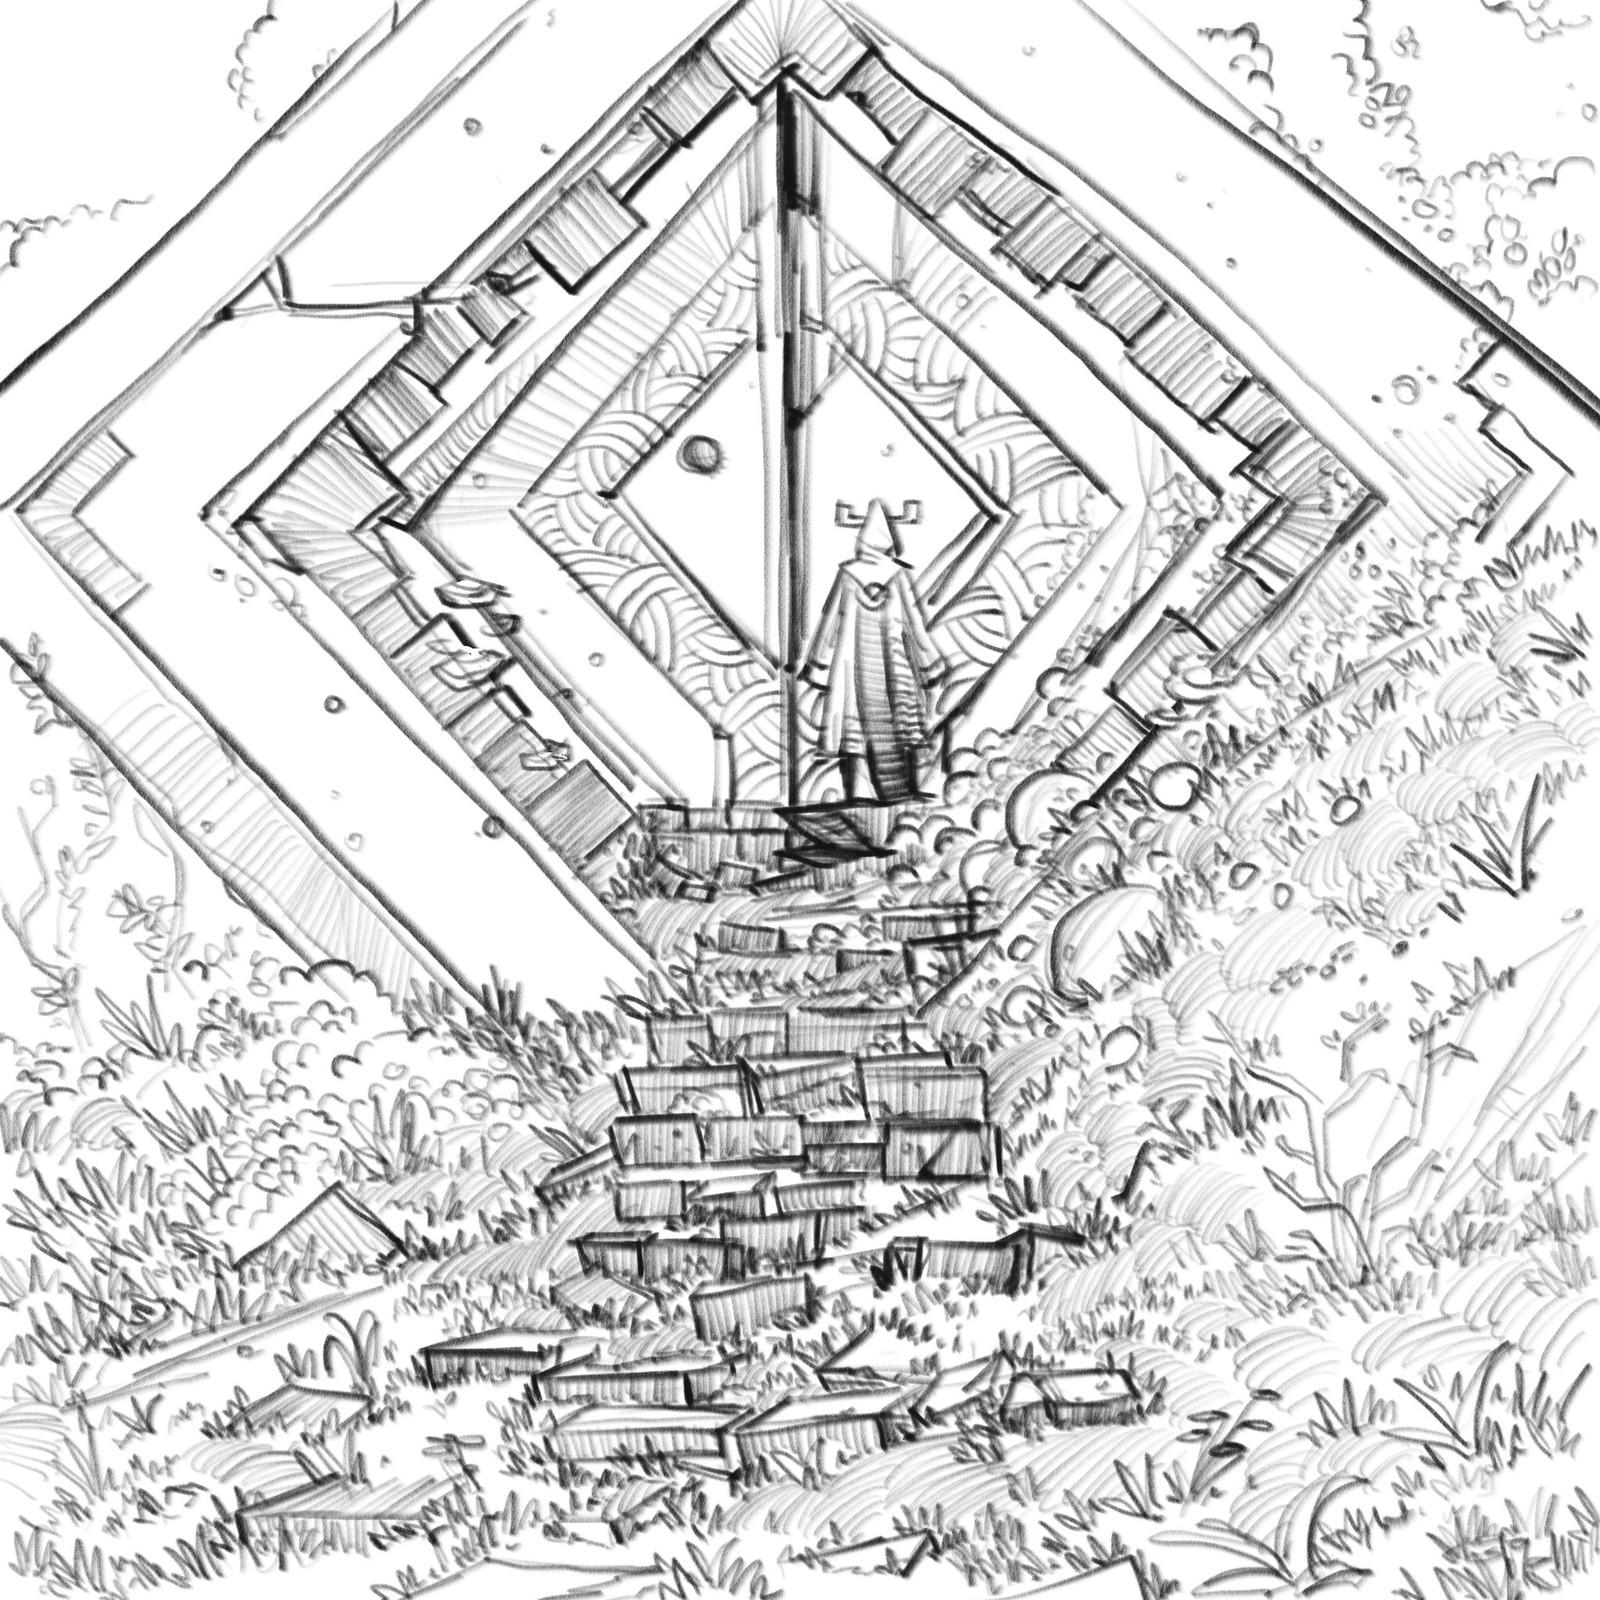 Forgotten Ruins - Sketches